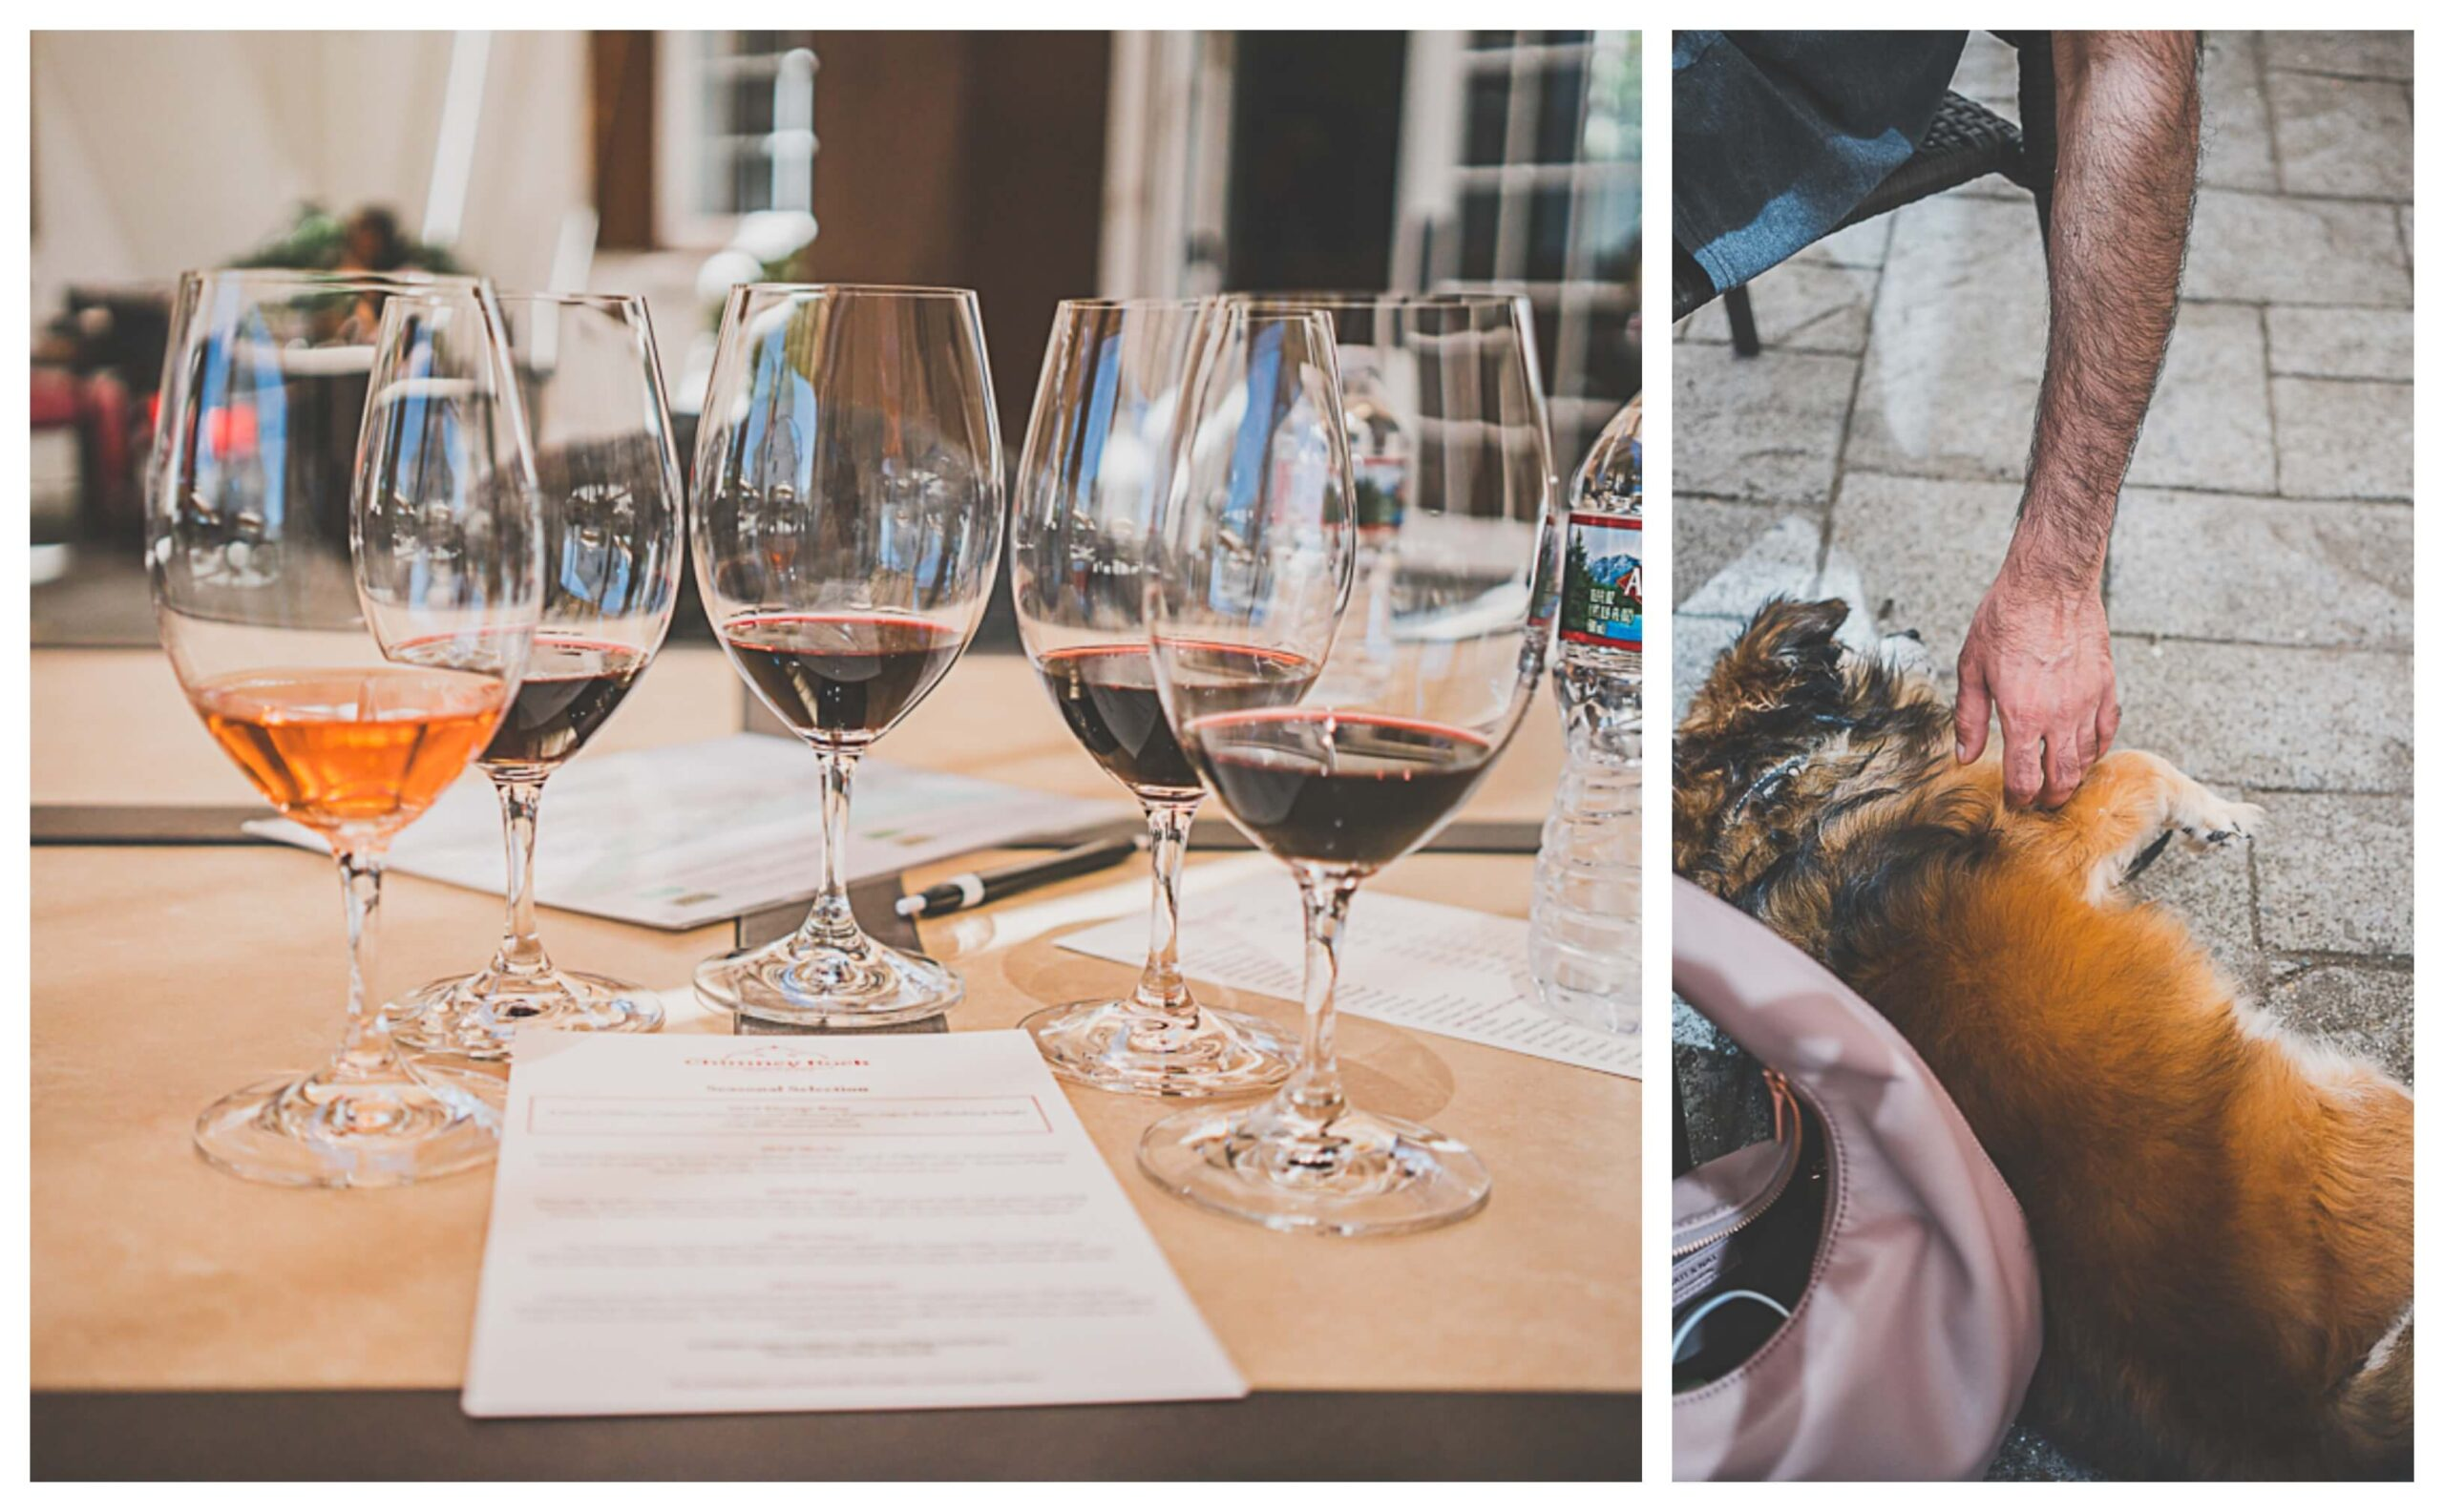 Chimney rock winery, dog friendly winery in Napa